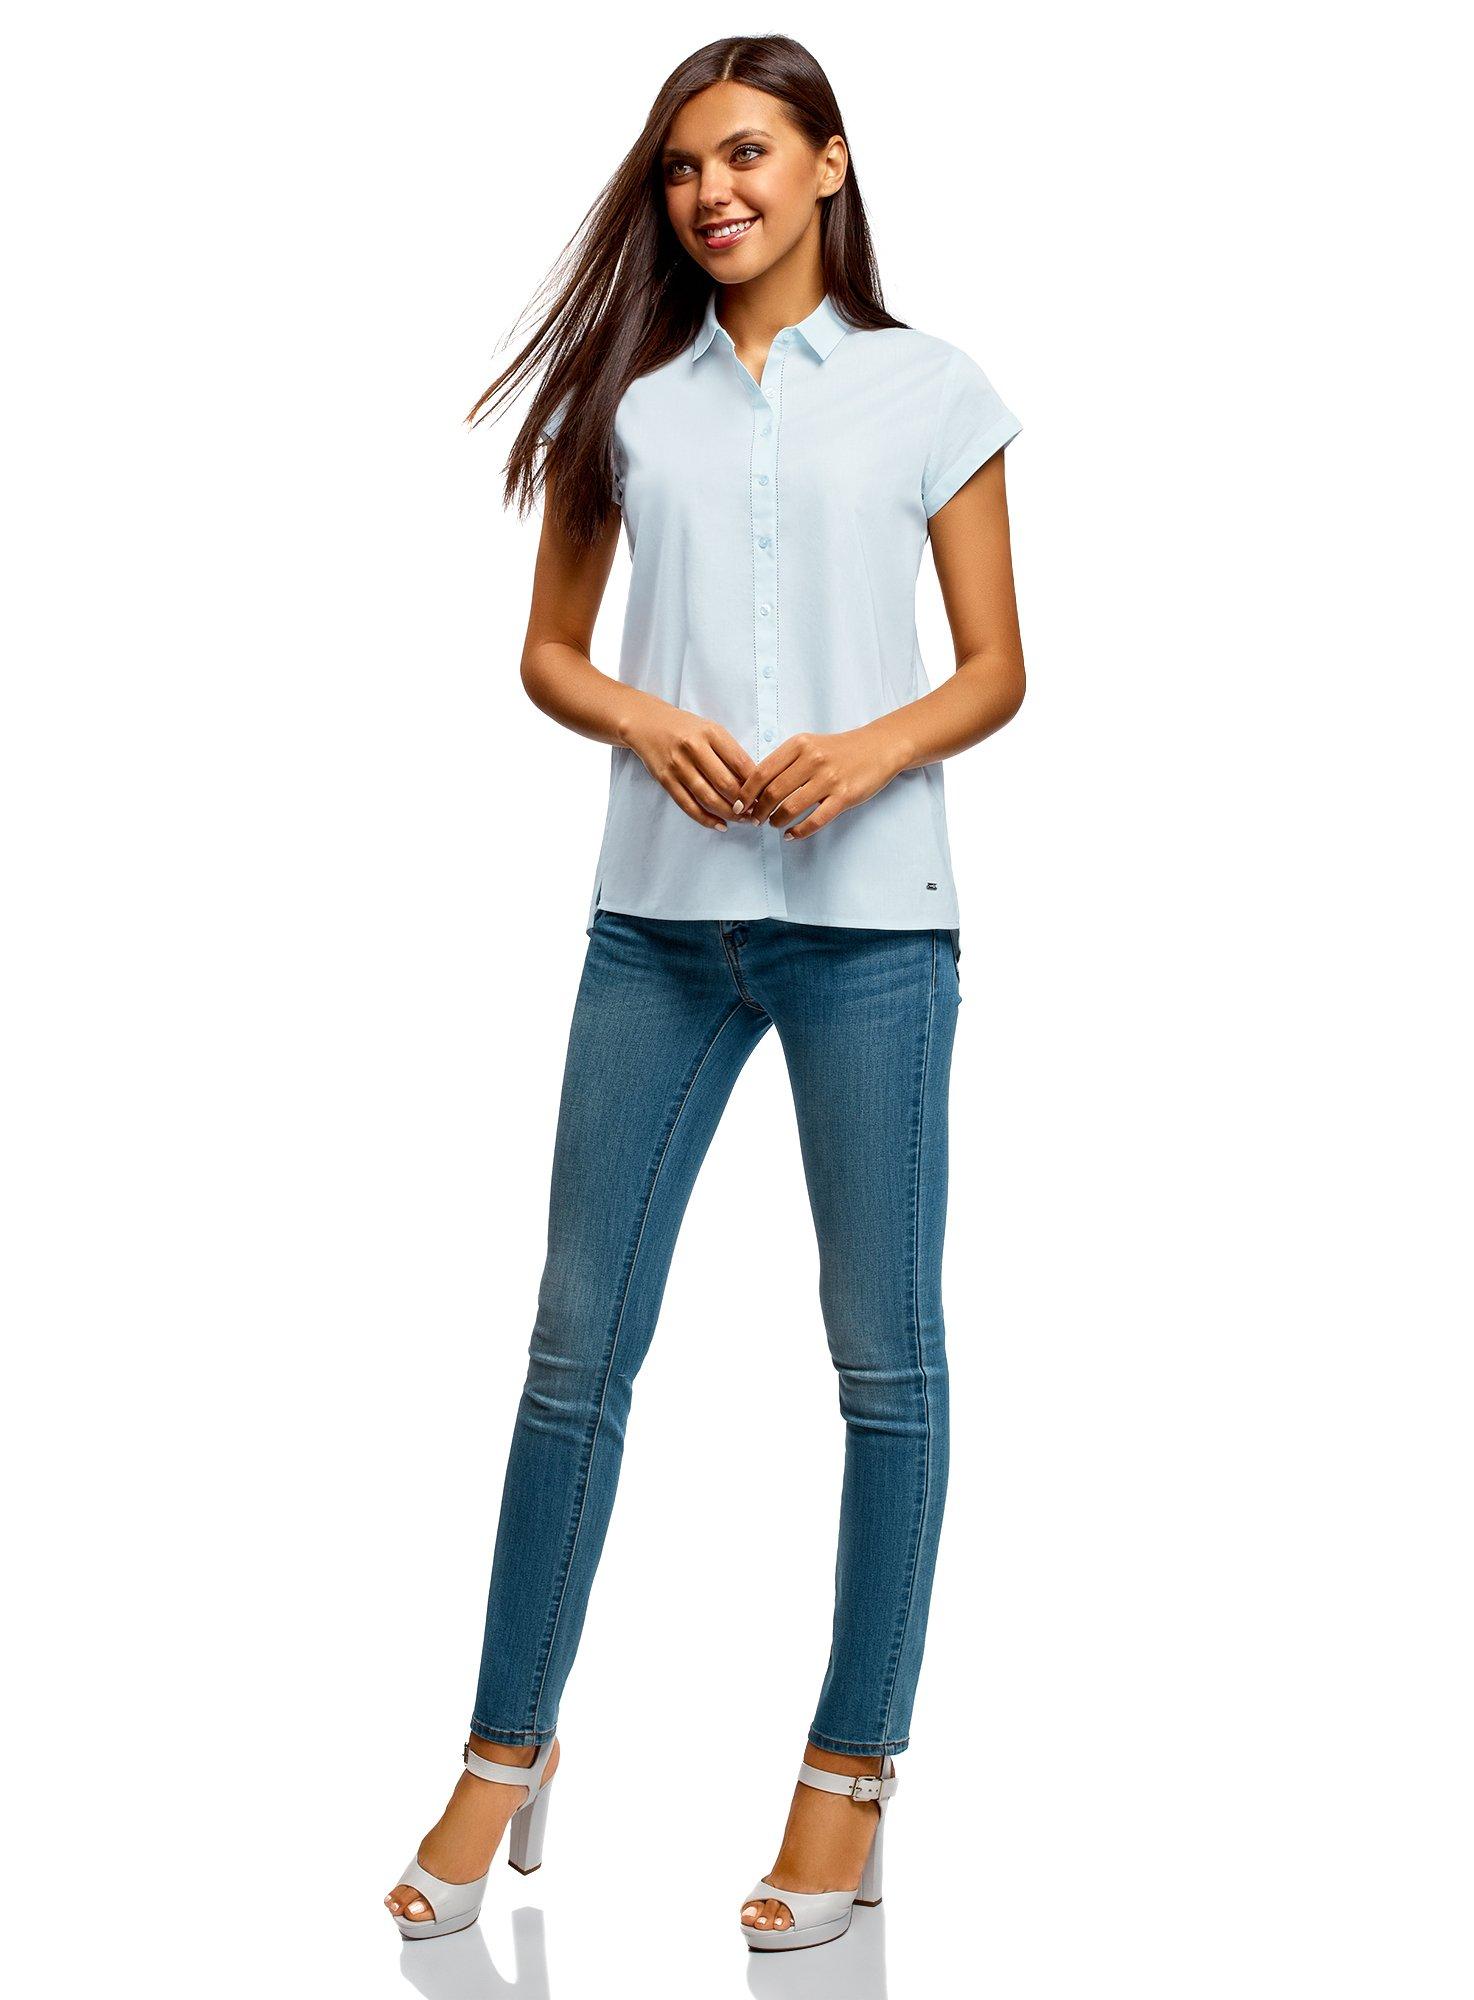 oodji Ultra Women's Short Sleeve Cotton Shirt with Turn-Ups, Blue, 2 by oodji (Image #6)